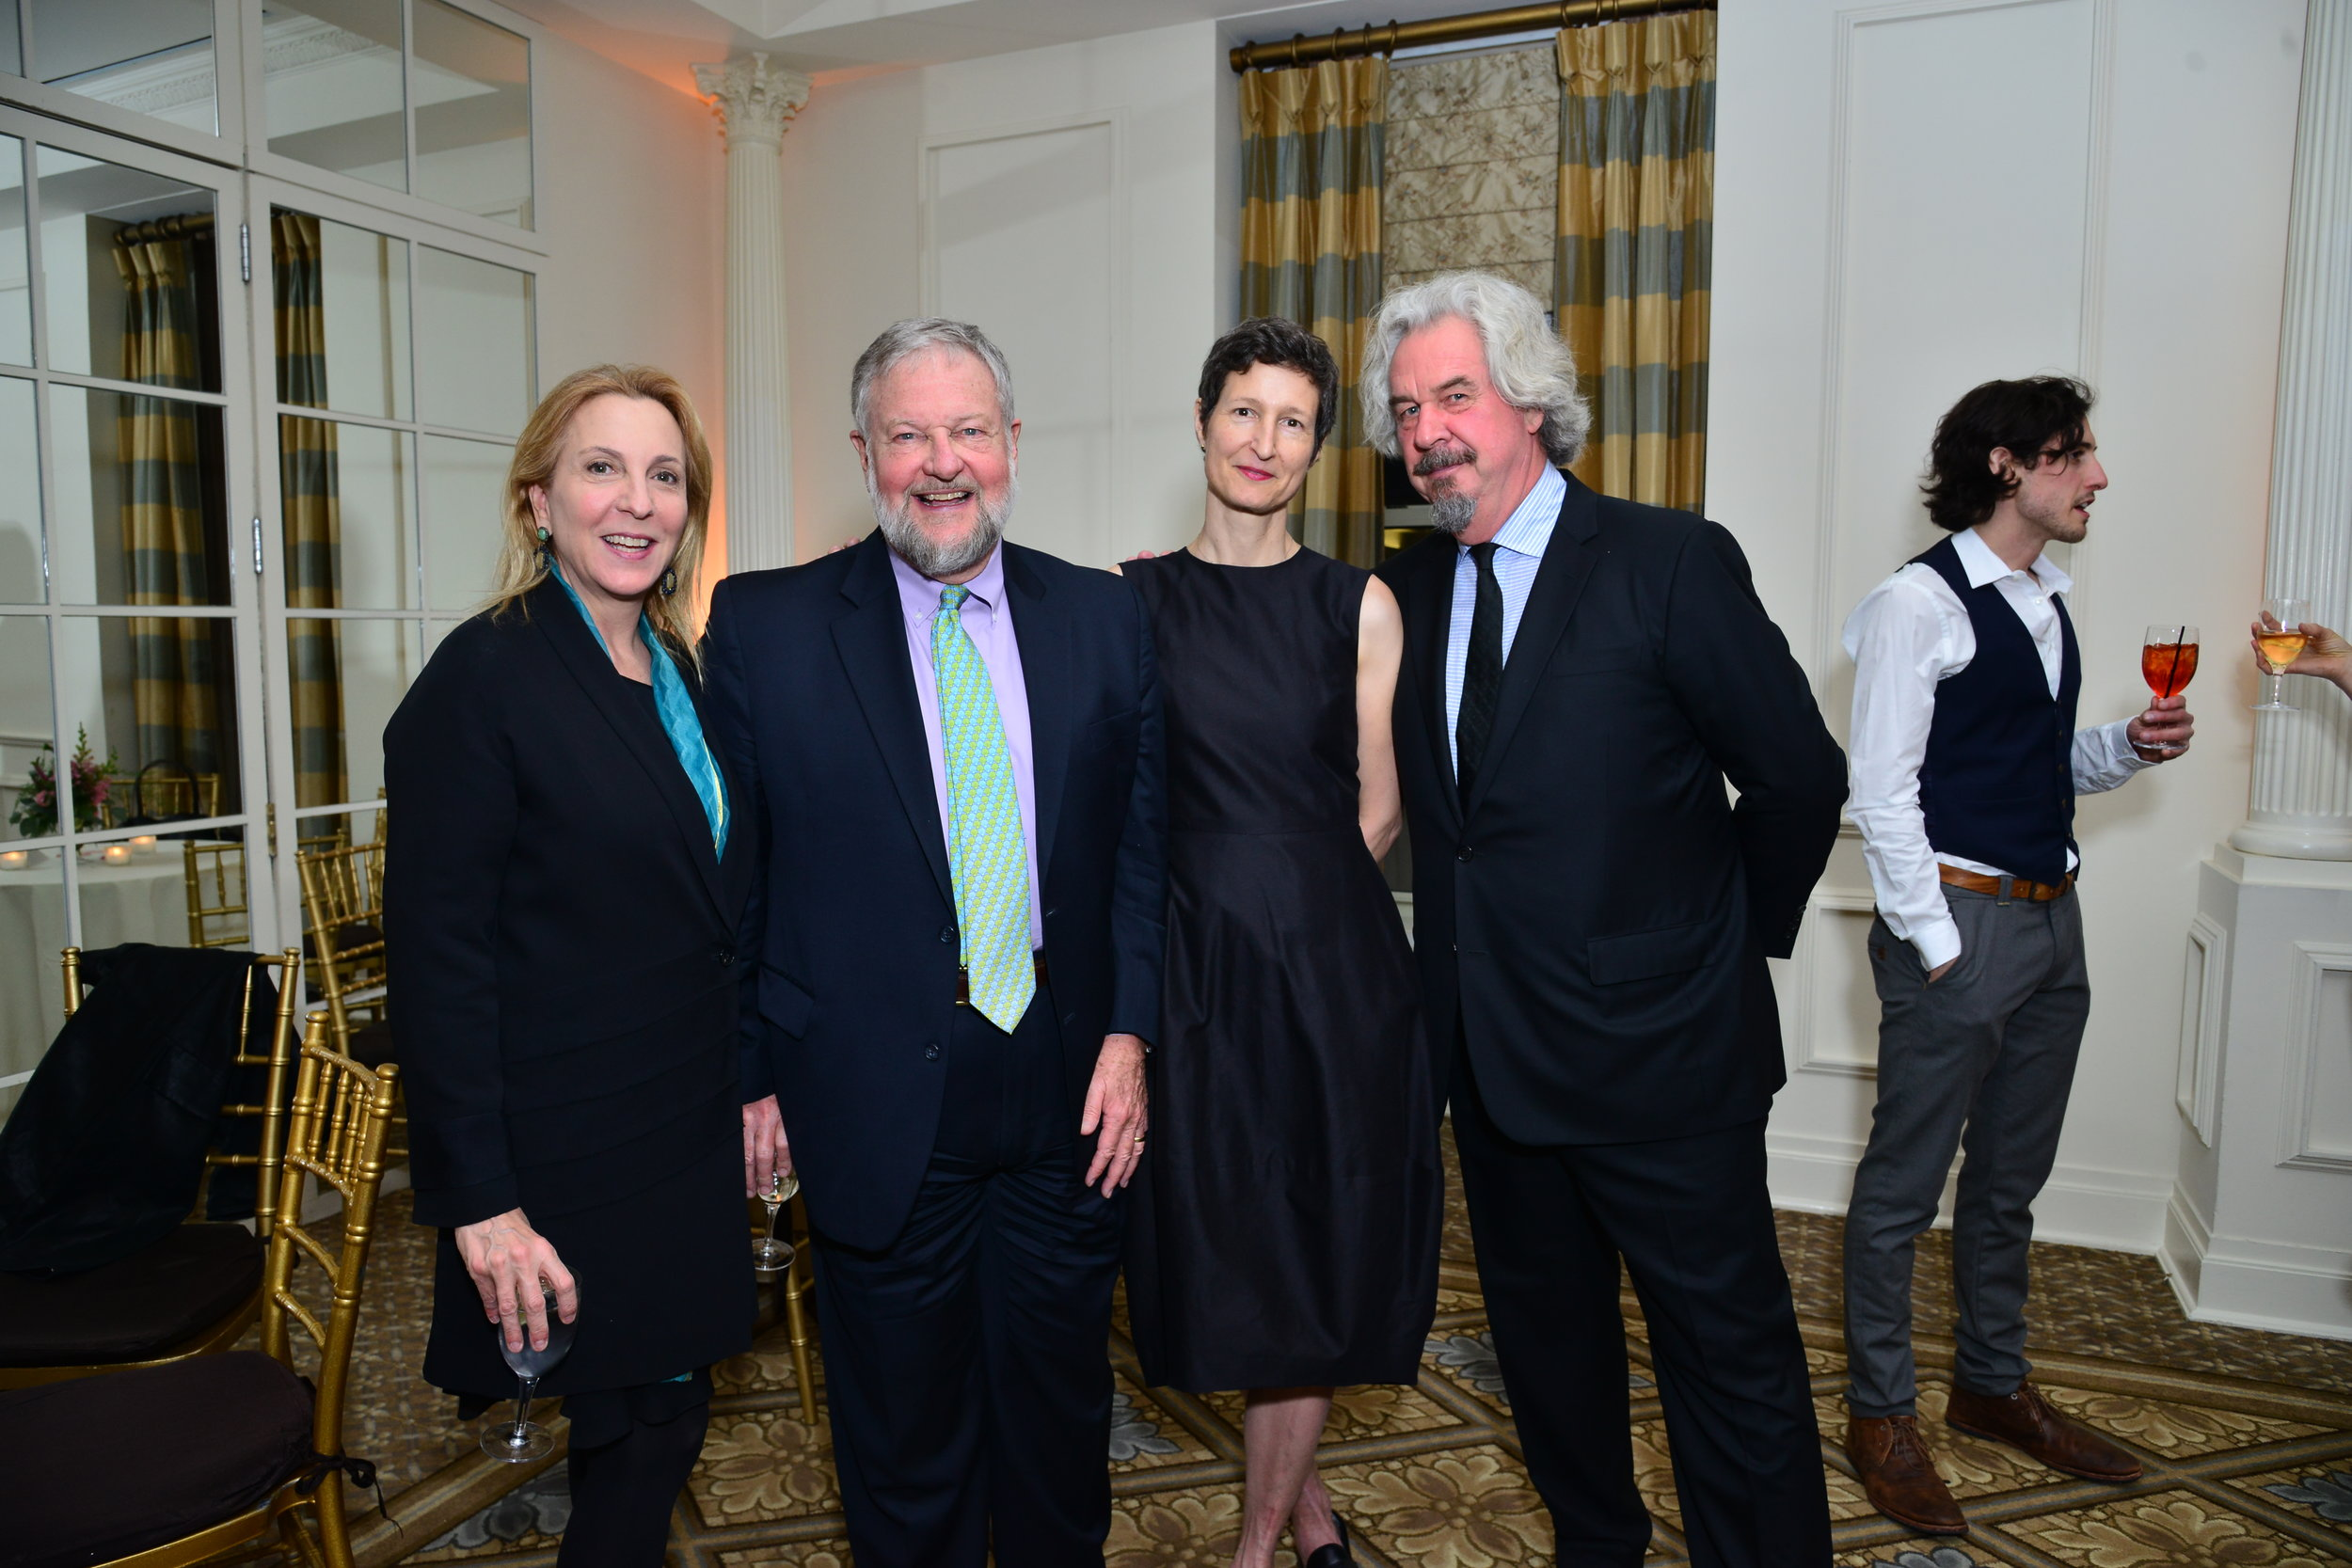 Susan Rockefeller, David Rockefeller, Kate Shepherd, Jack Shear==Skowhegan 70th Anniversary Celebration & 2016 Awards Dinner== The Plaza, NYC==April 26, 2016==�Patrick McMullan==Photo � Jared Siskin/PMC==